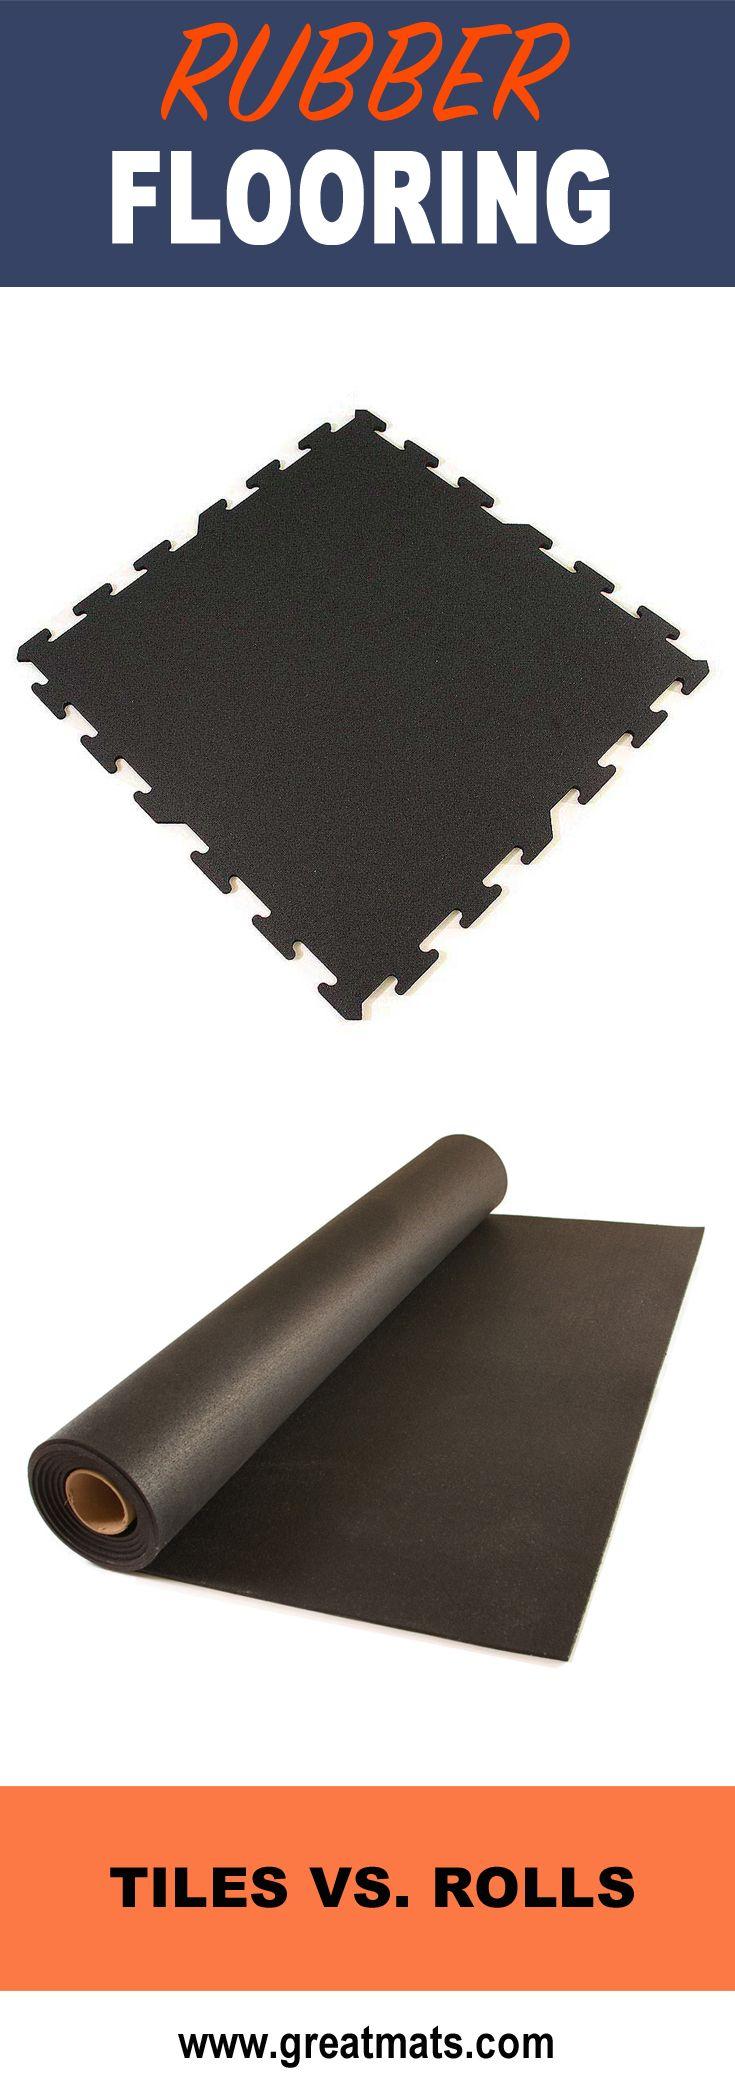 Interlocking Rubber Tile 2x2 Ft x 8 mm Black Rubber